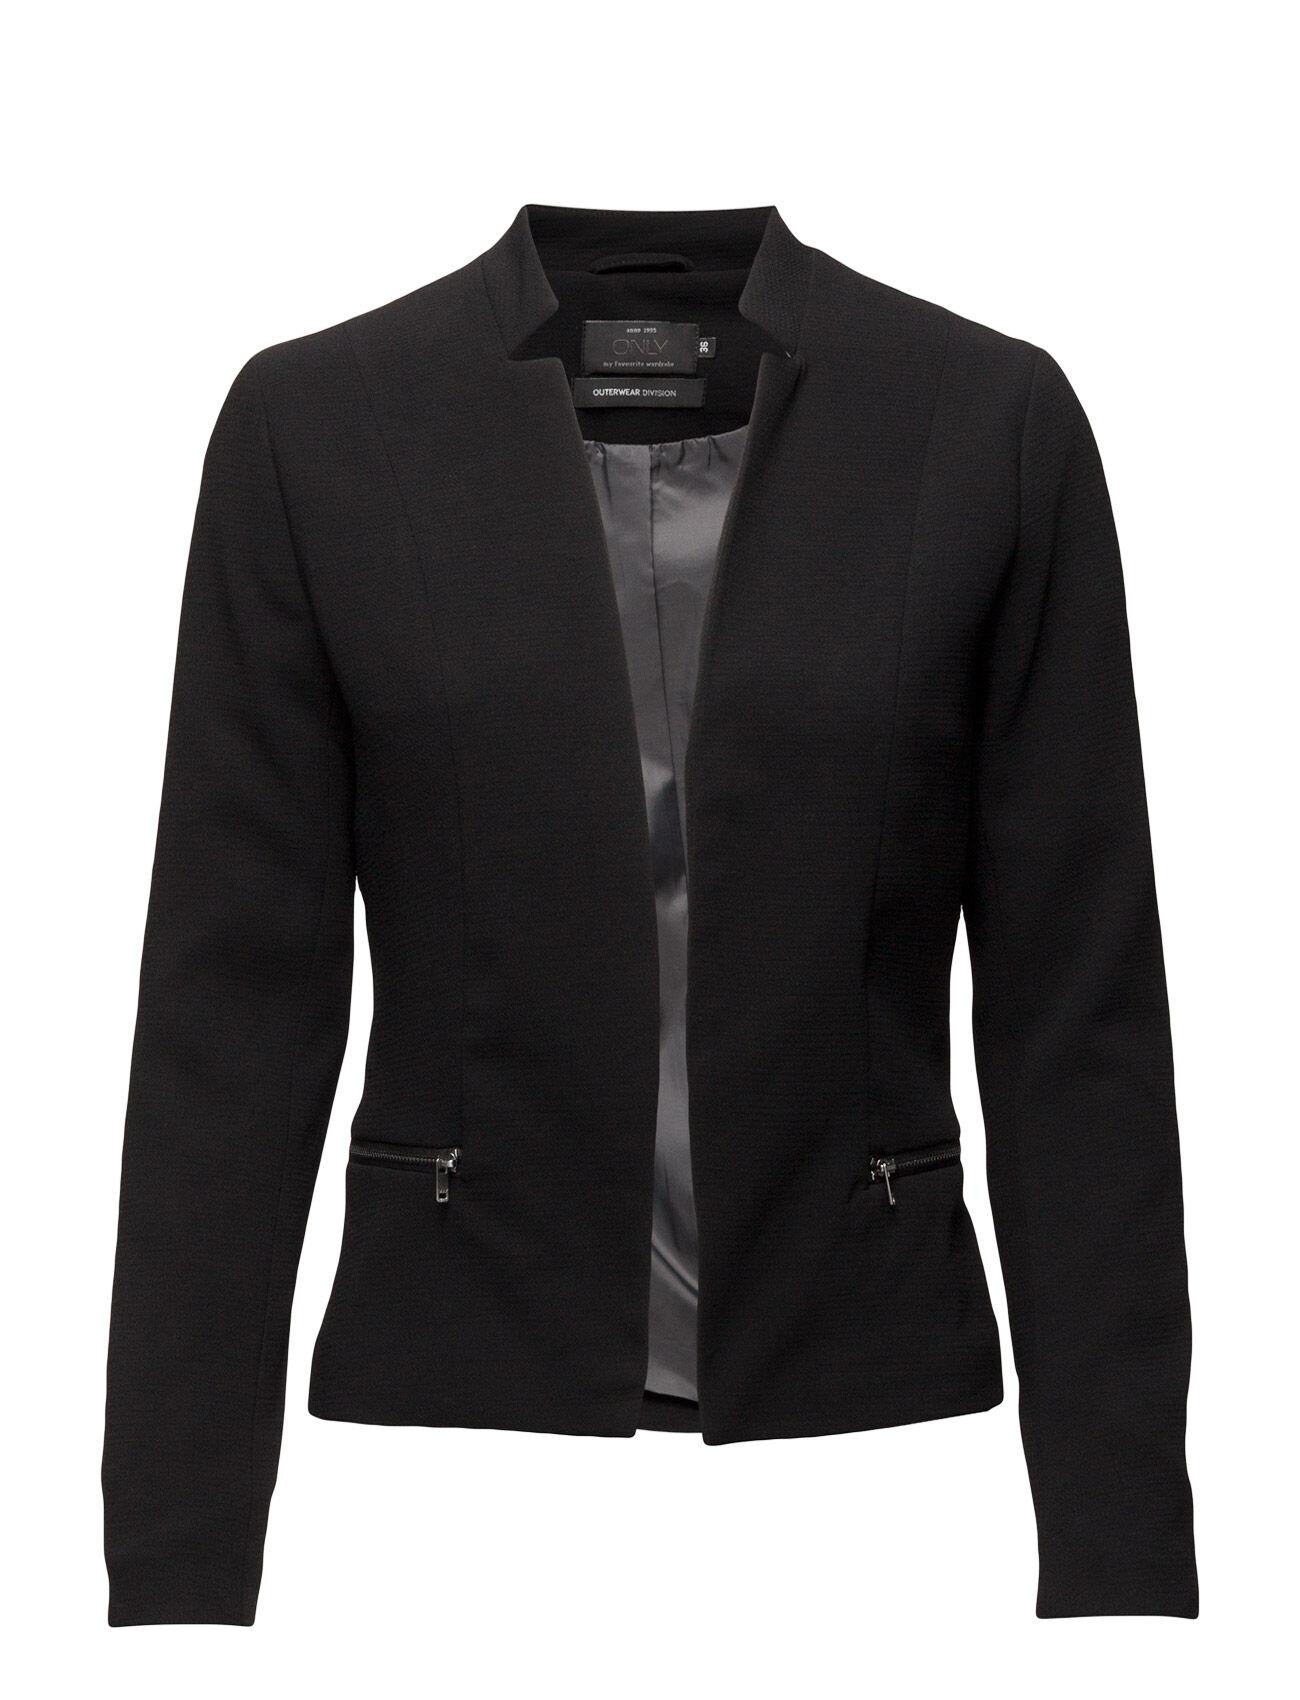 Image of ONLY Onlmadeline Blazer Jacket Aw Otw Noos Bleiseri Puvun Takki Musta ONLY